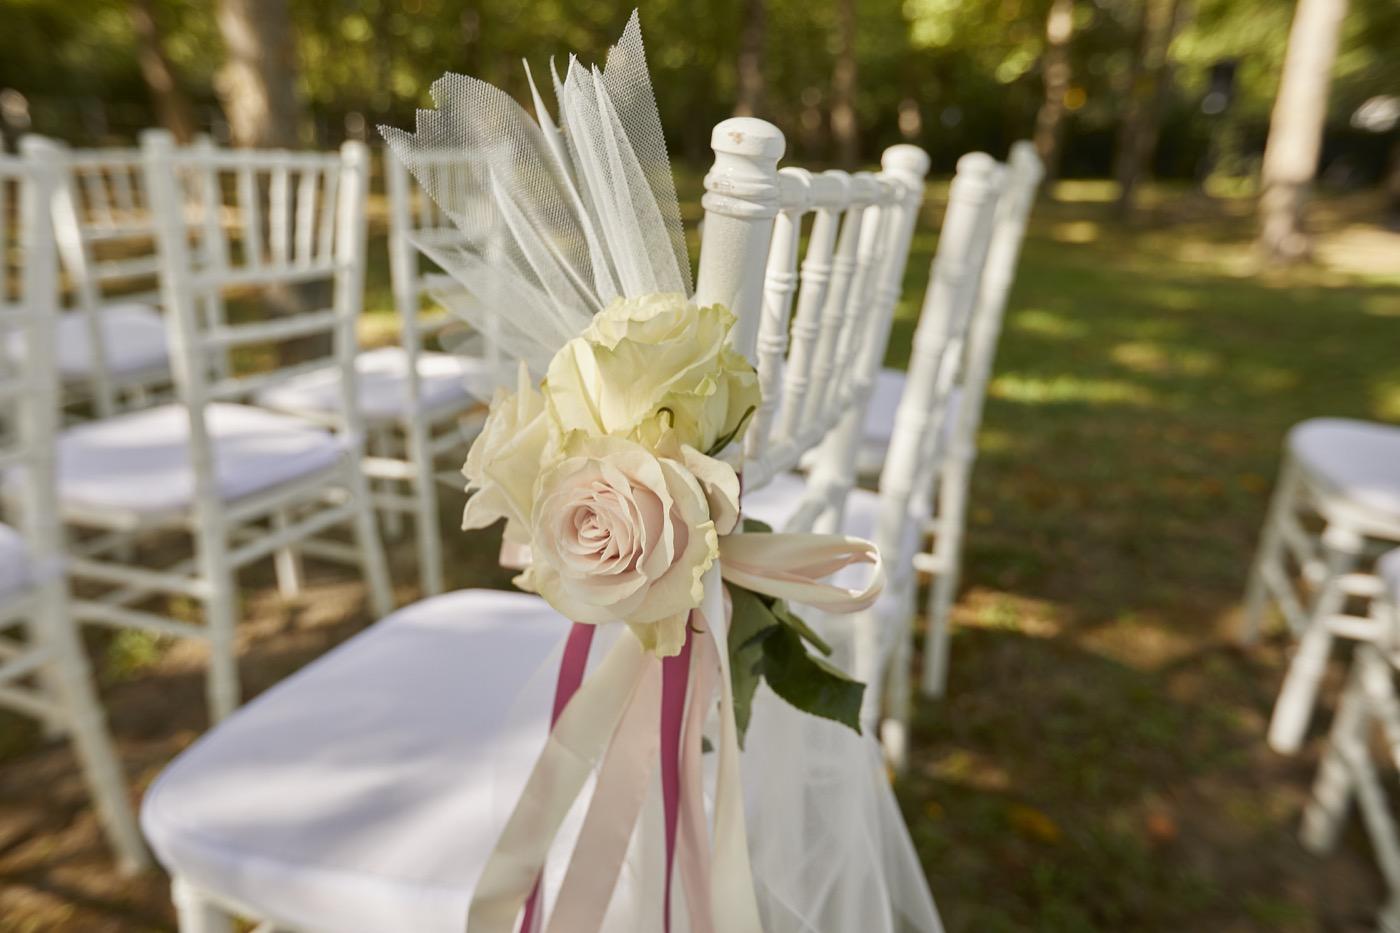 Claudio-Coppola-wedding-photographer-la-scuderia-eventi-preparativi-la-rosetta-perugia-35